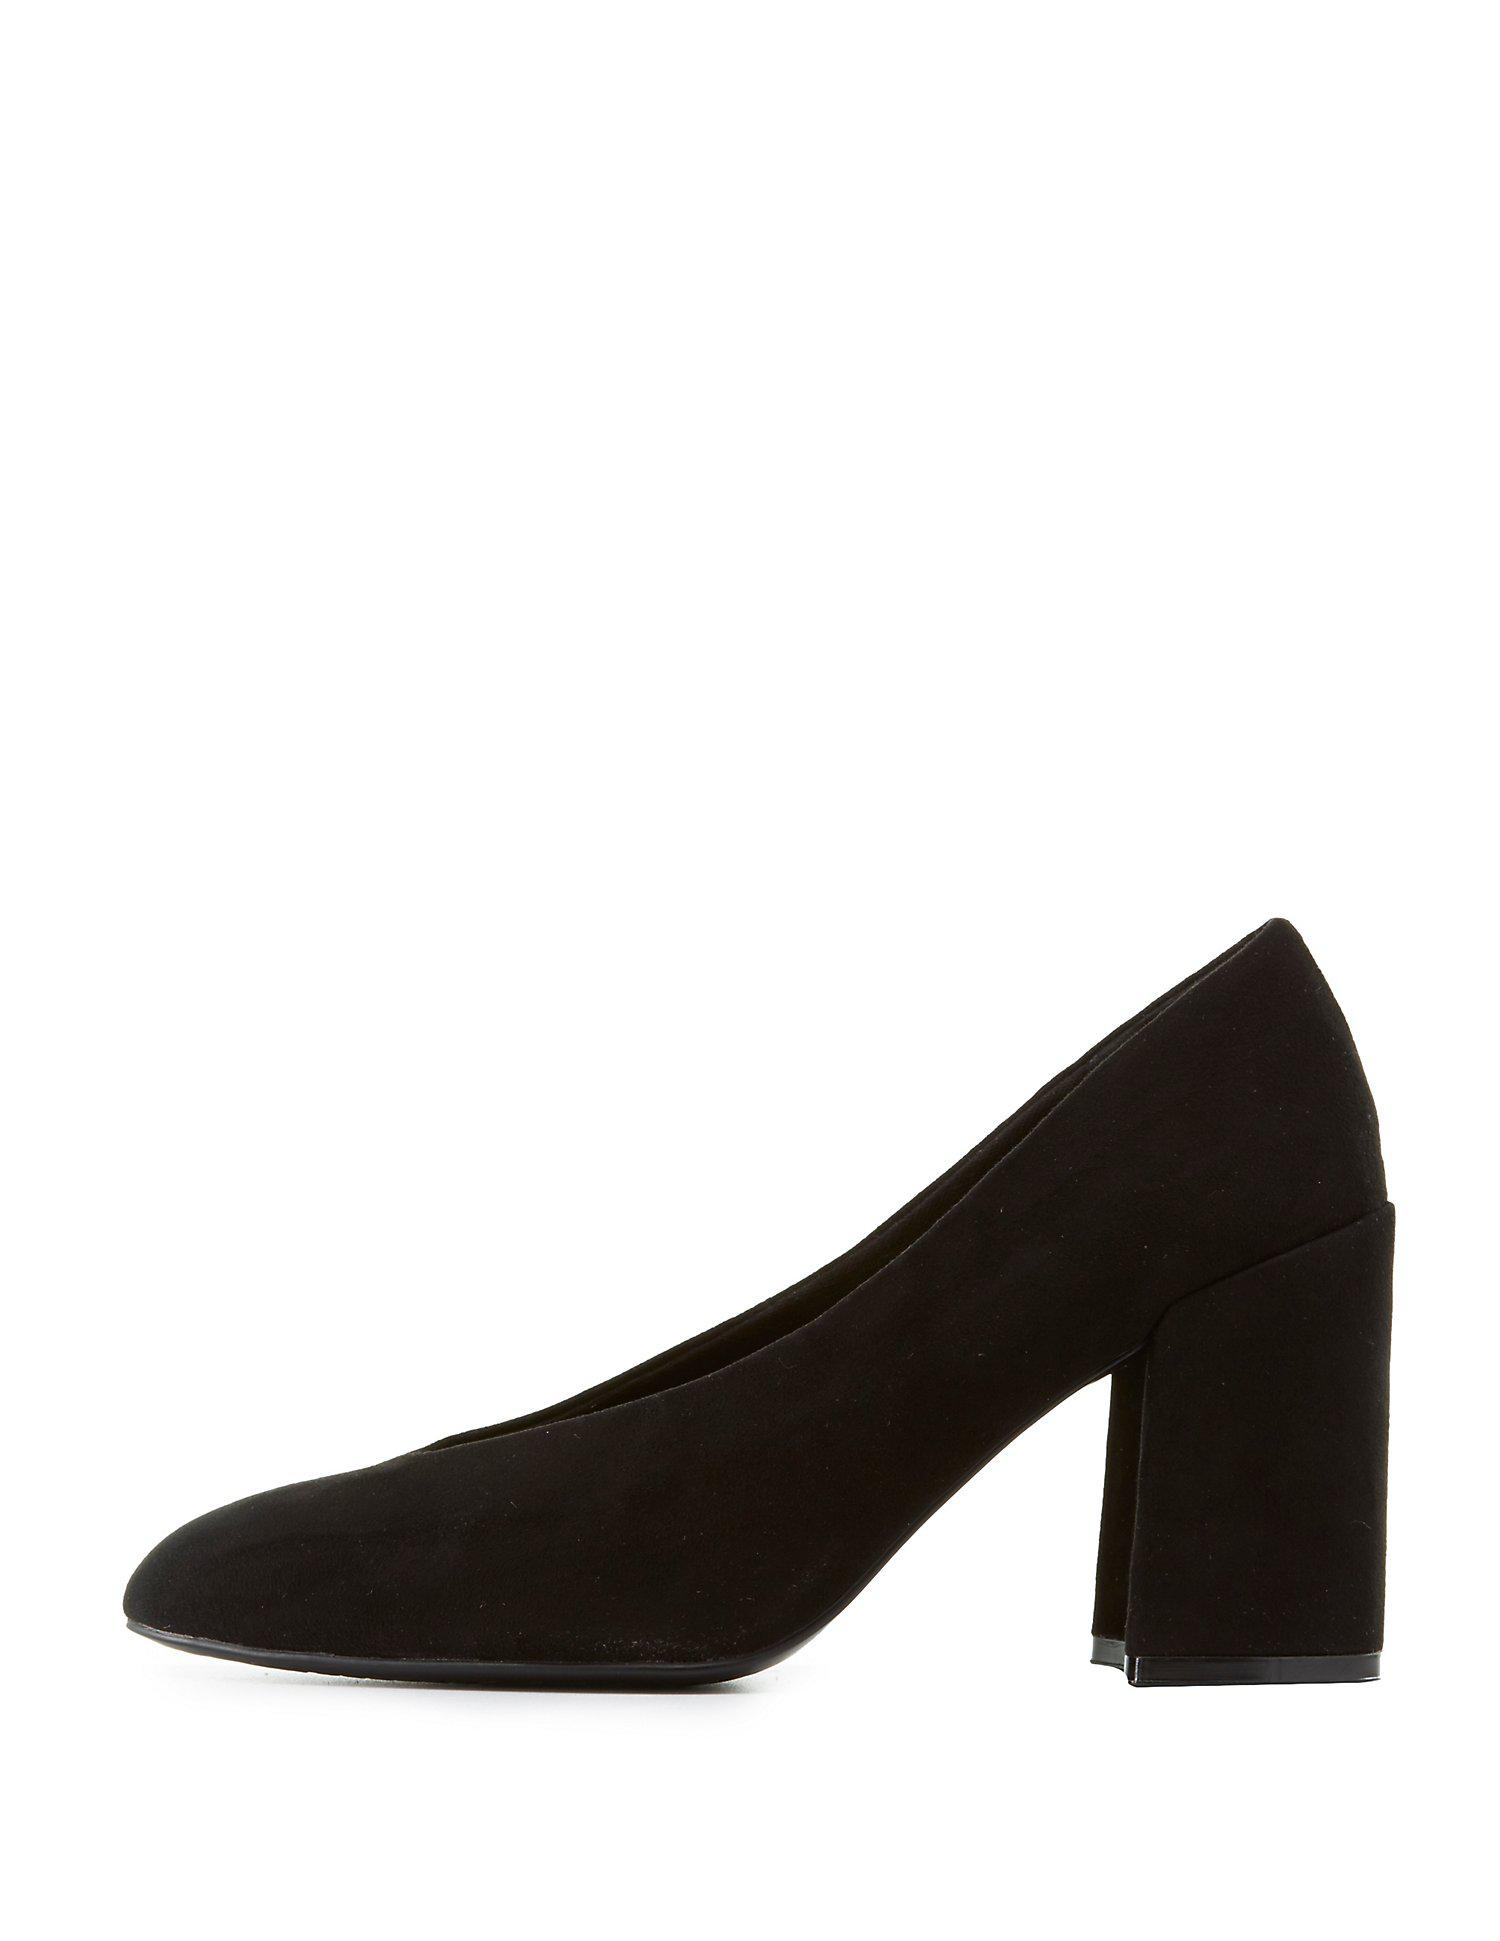 0dae085cfd Lyst - Charlotte Russe Qupid Pointed Toe Block Heel Pumps in Black ...